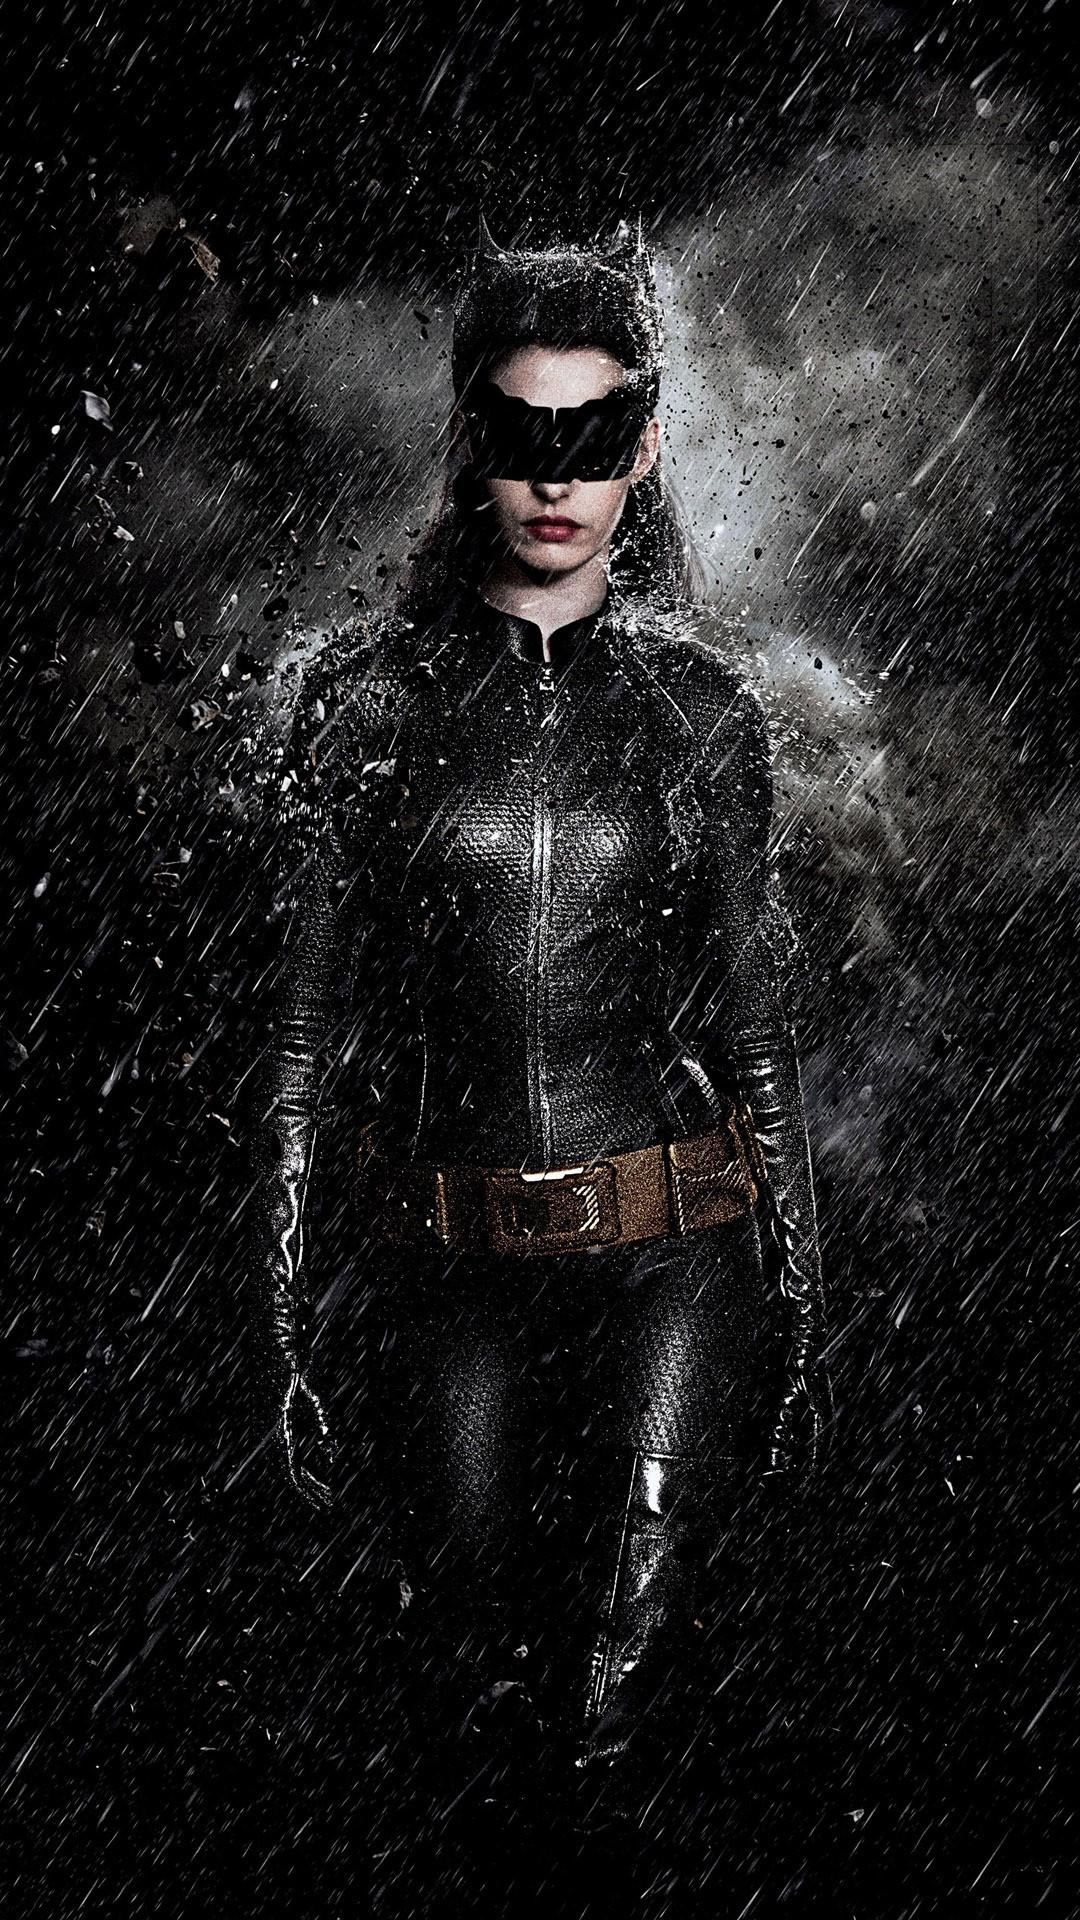 catwoman – the dark knight rises mobile wallpaper 12743